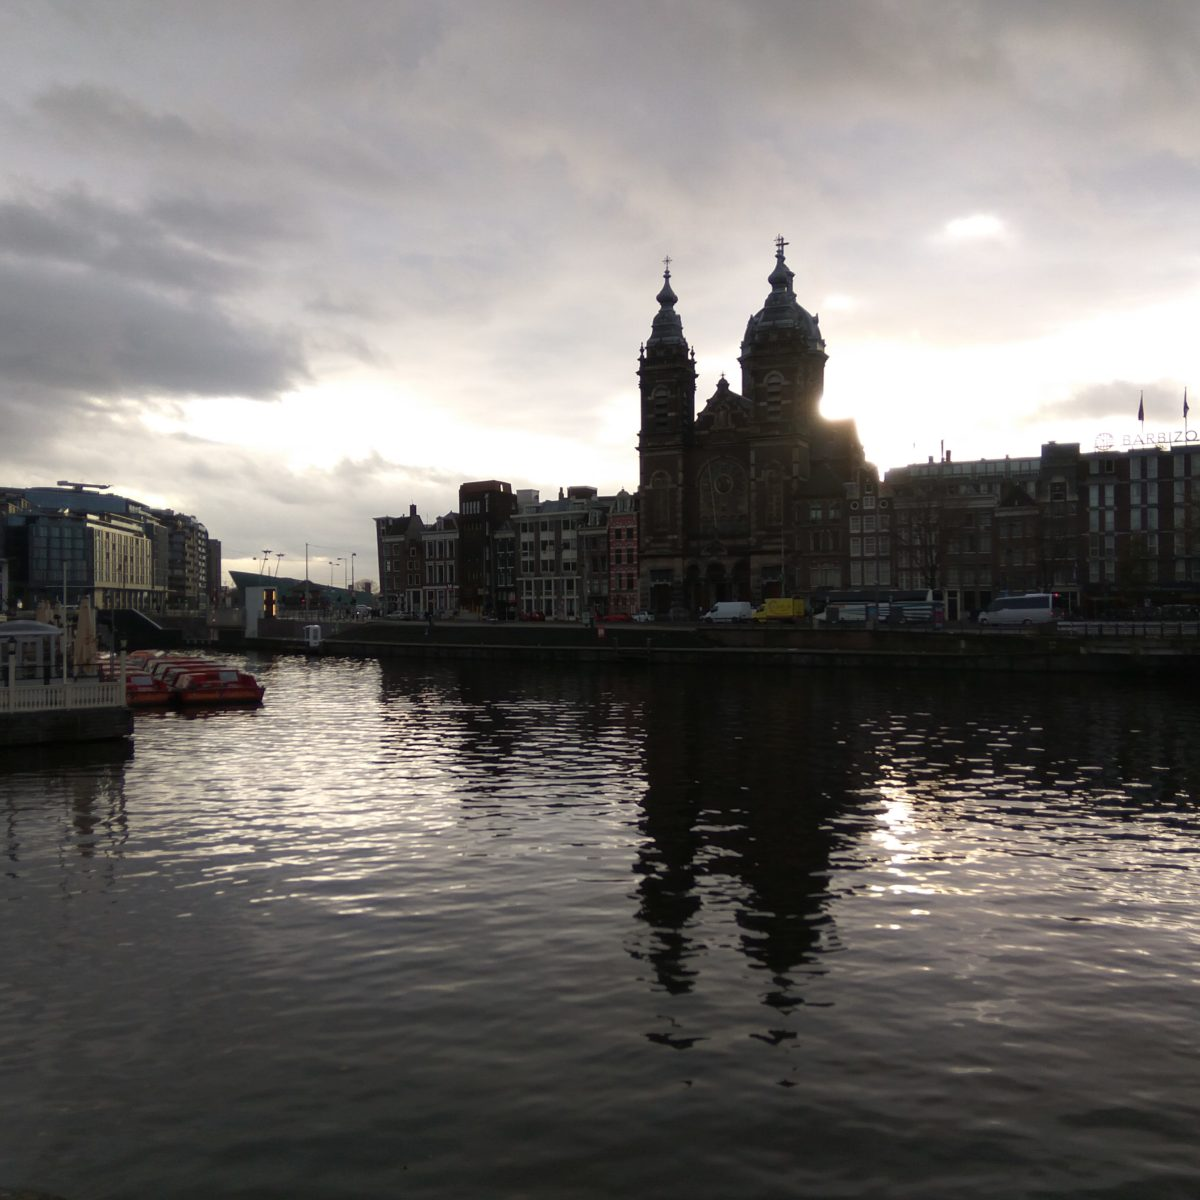 Amsterdam Central Railway Station